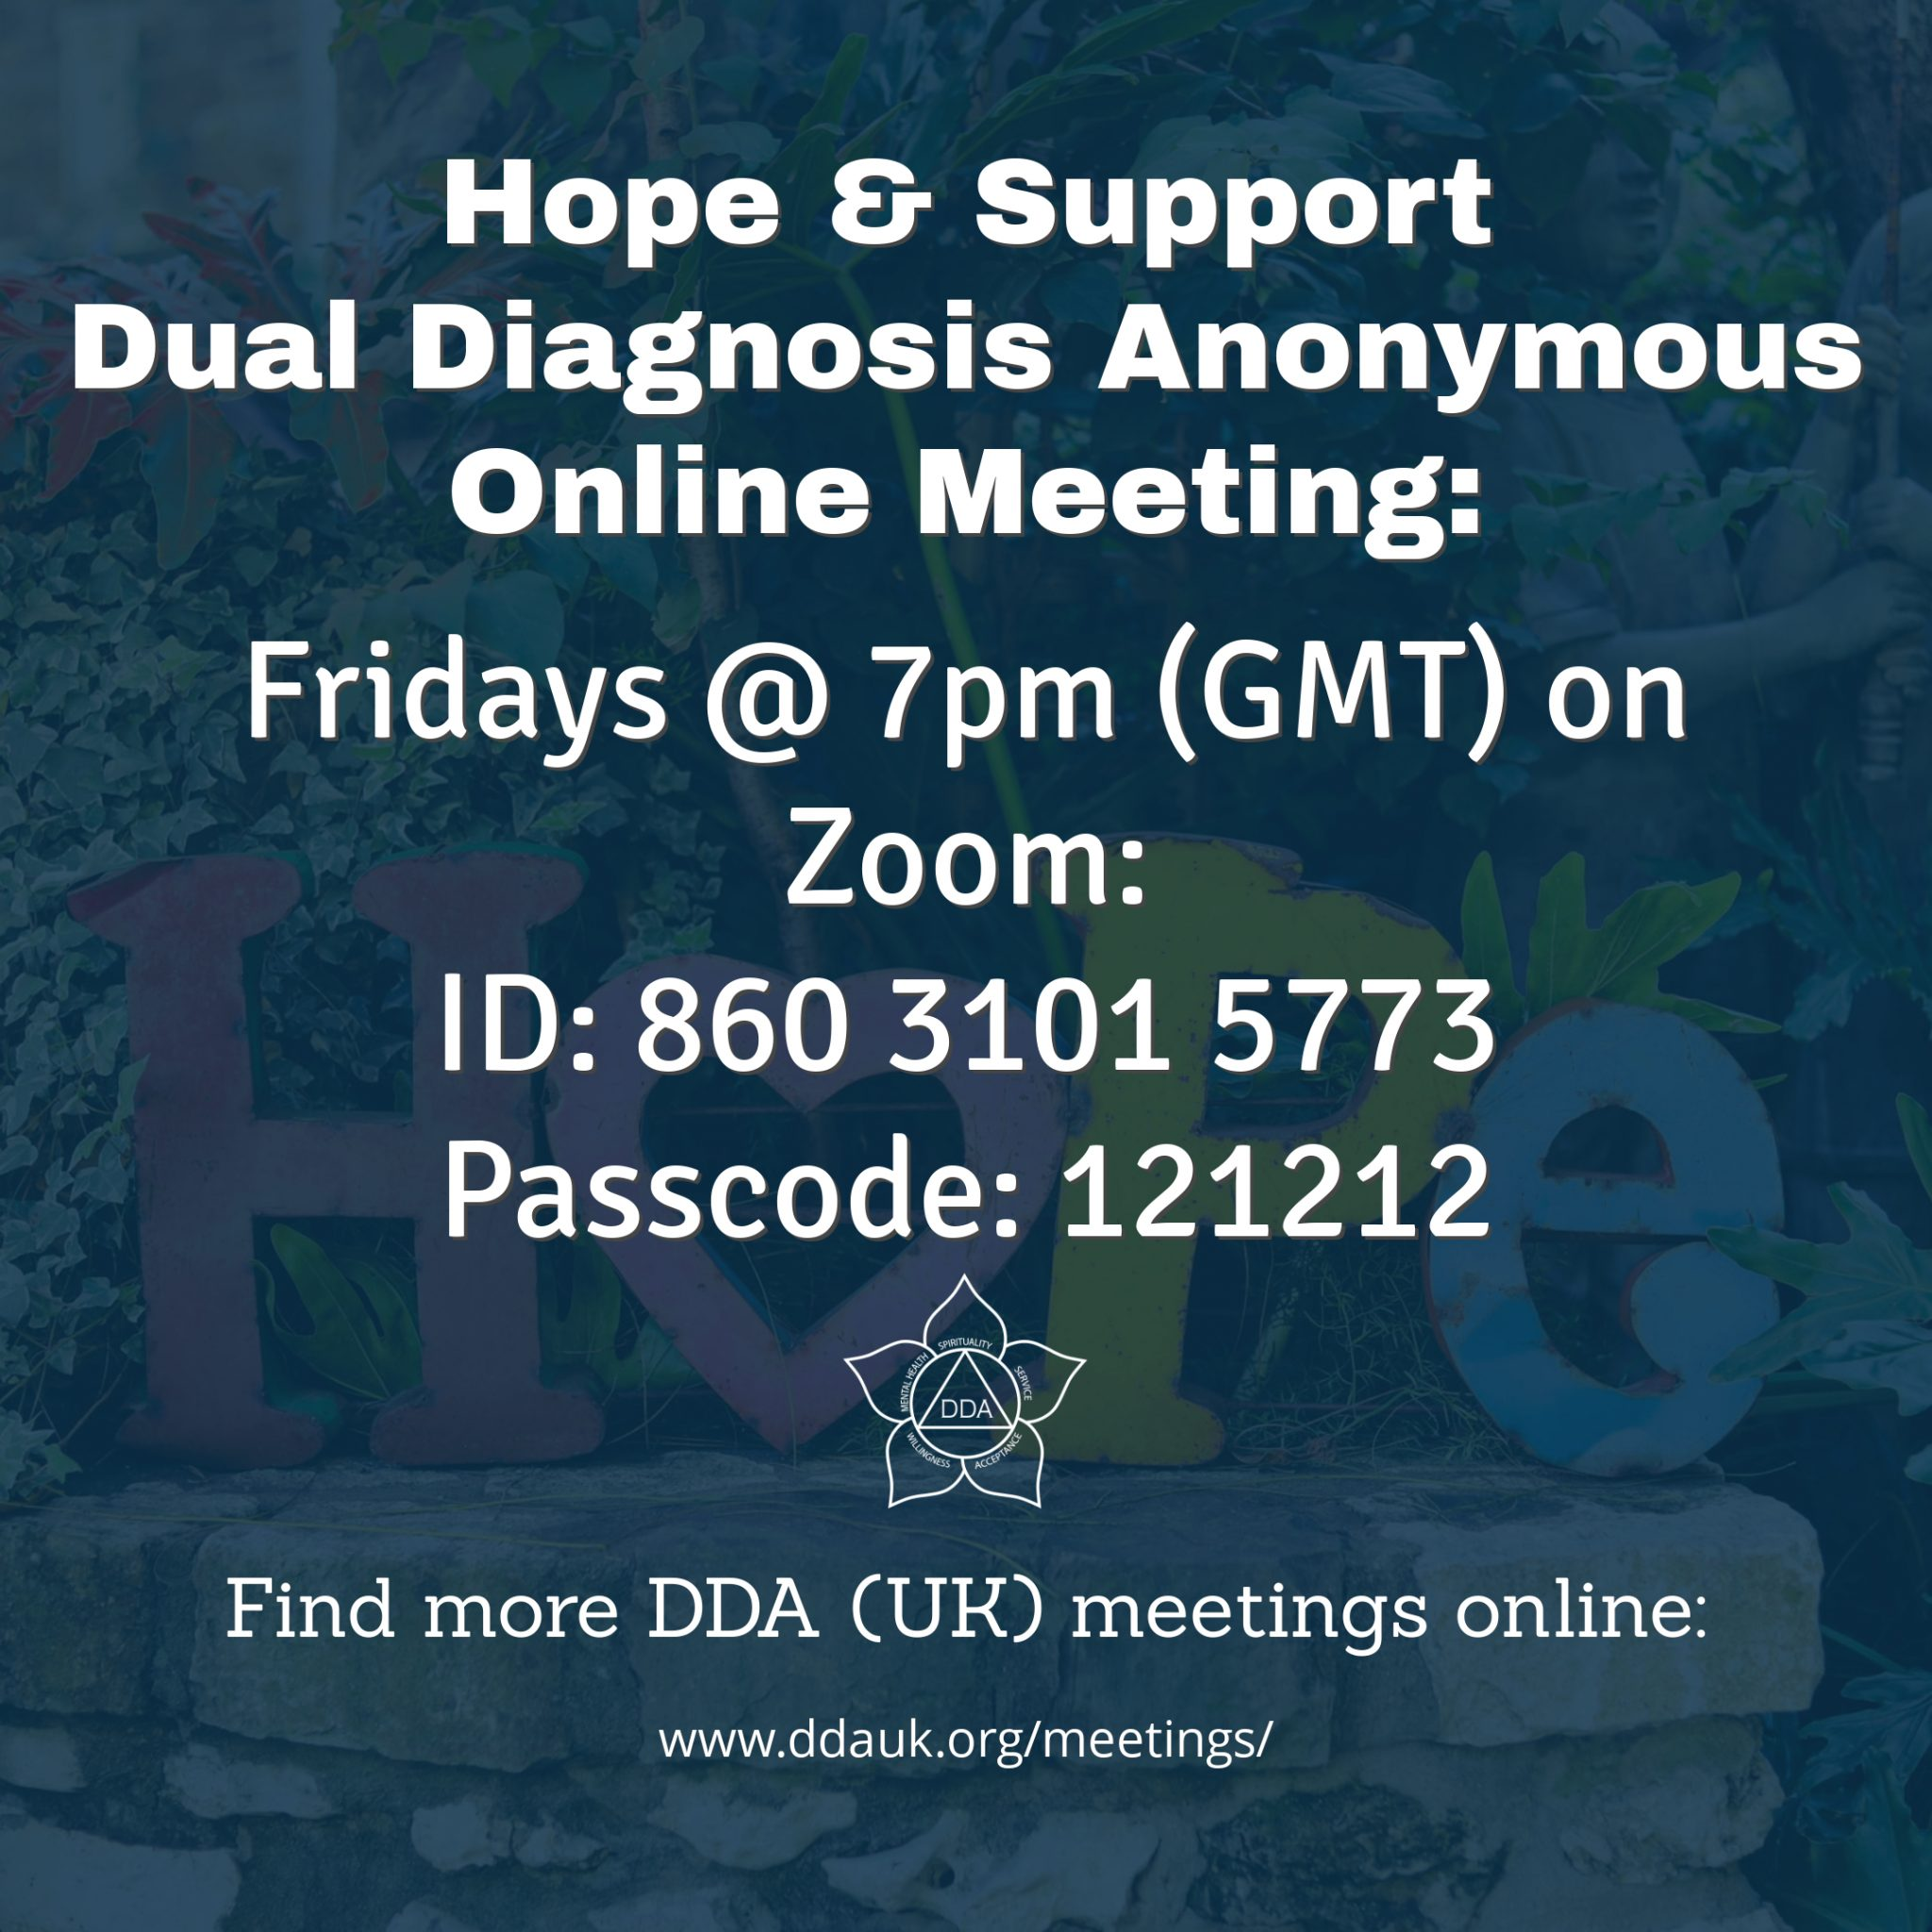 Friday Hope & Support DDA Zoom Meeting